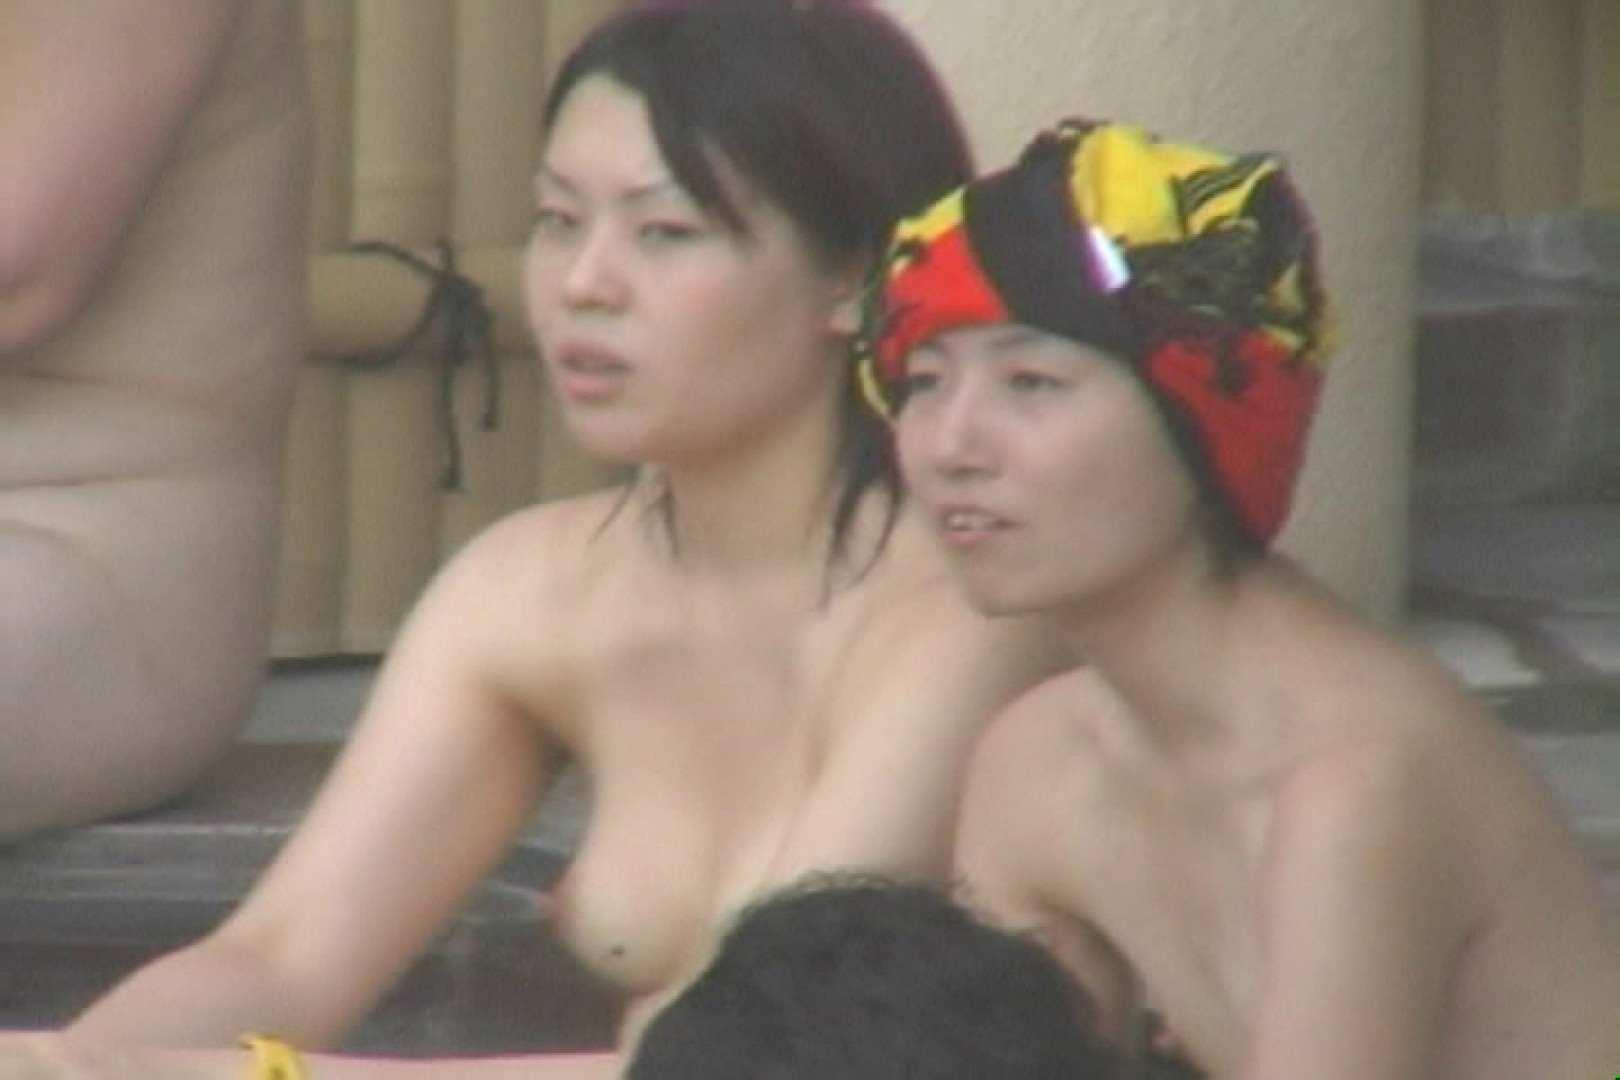 Aquaな露天風呂Vol.61【VIP限定】 いやらしいOL エロ無料画像 89連発 82